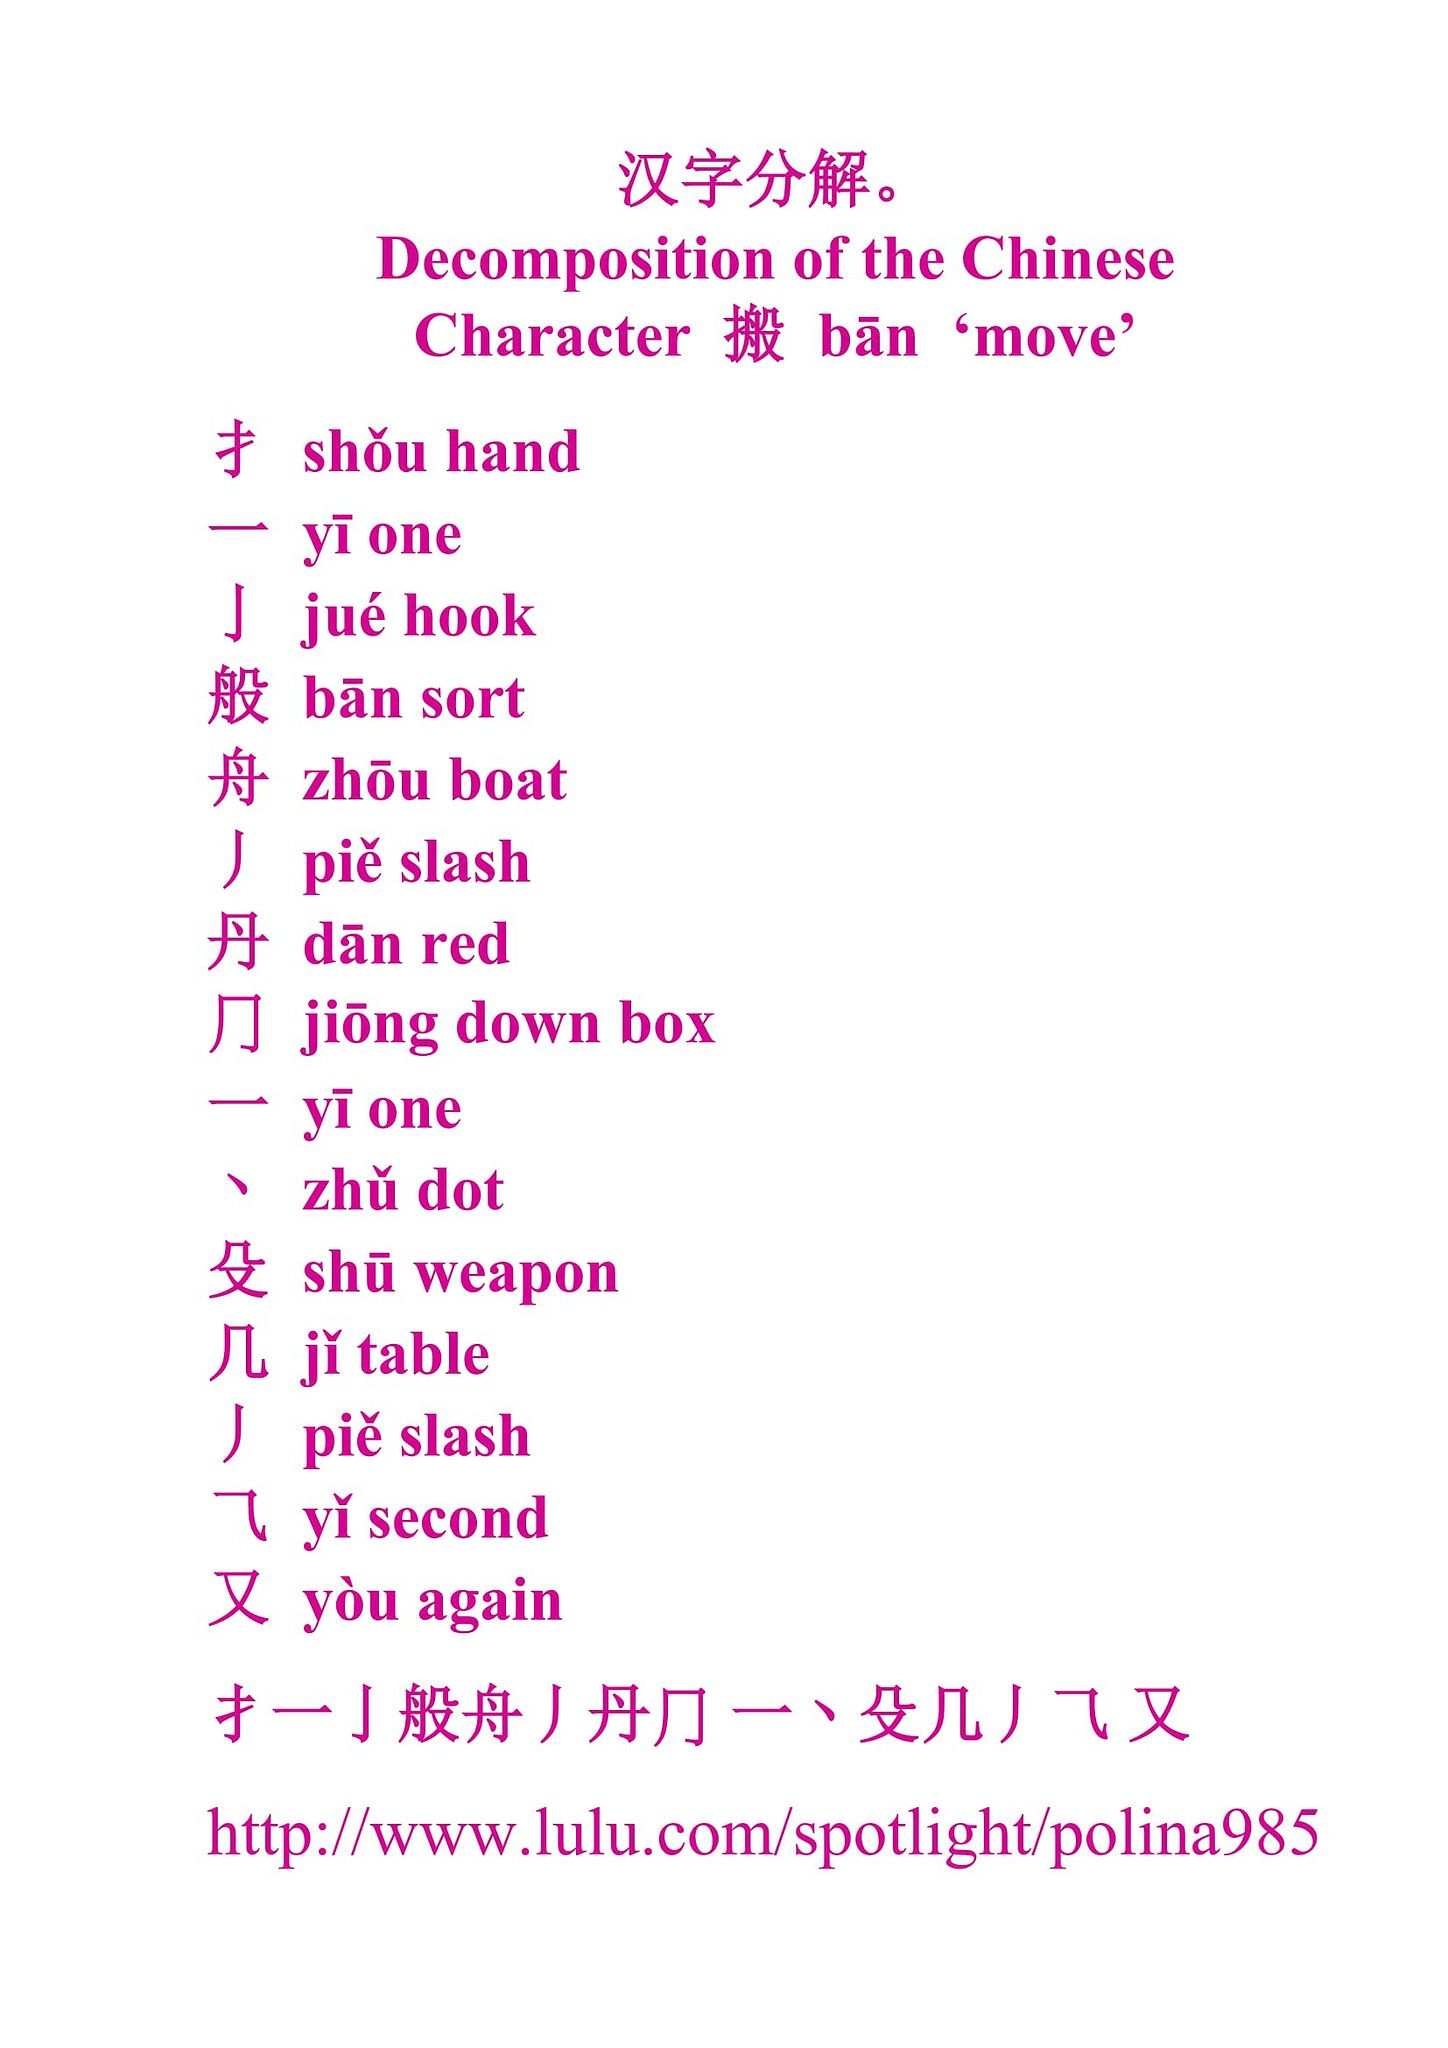 Chinese, Chinese-English, addition, advanced, analysis, arithmetic ...